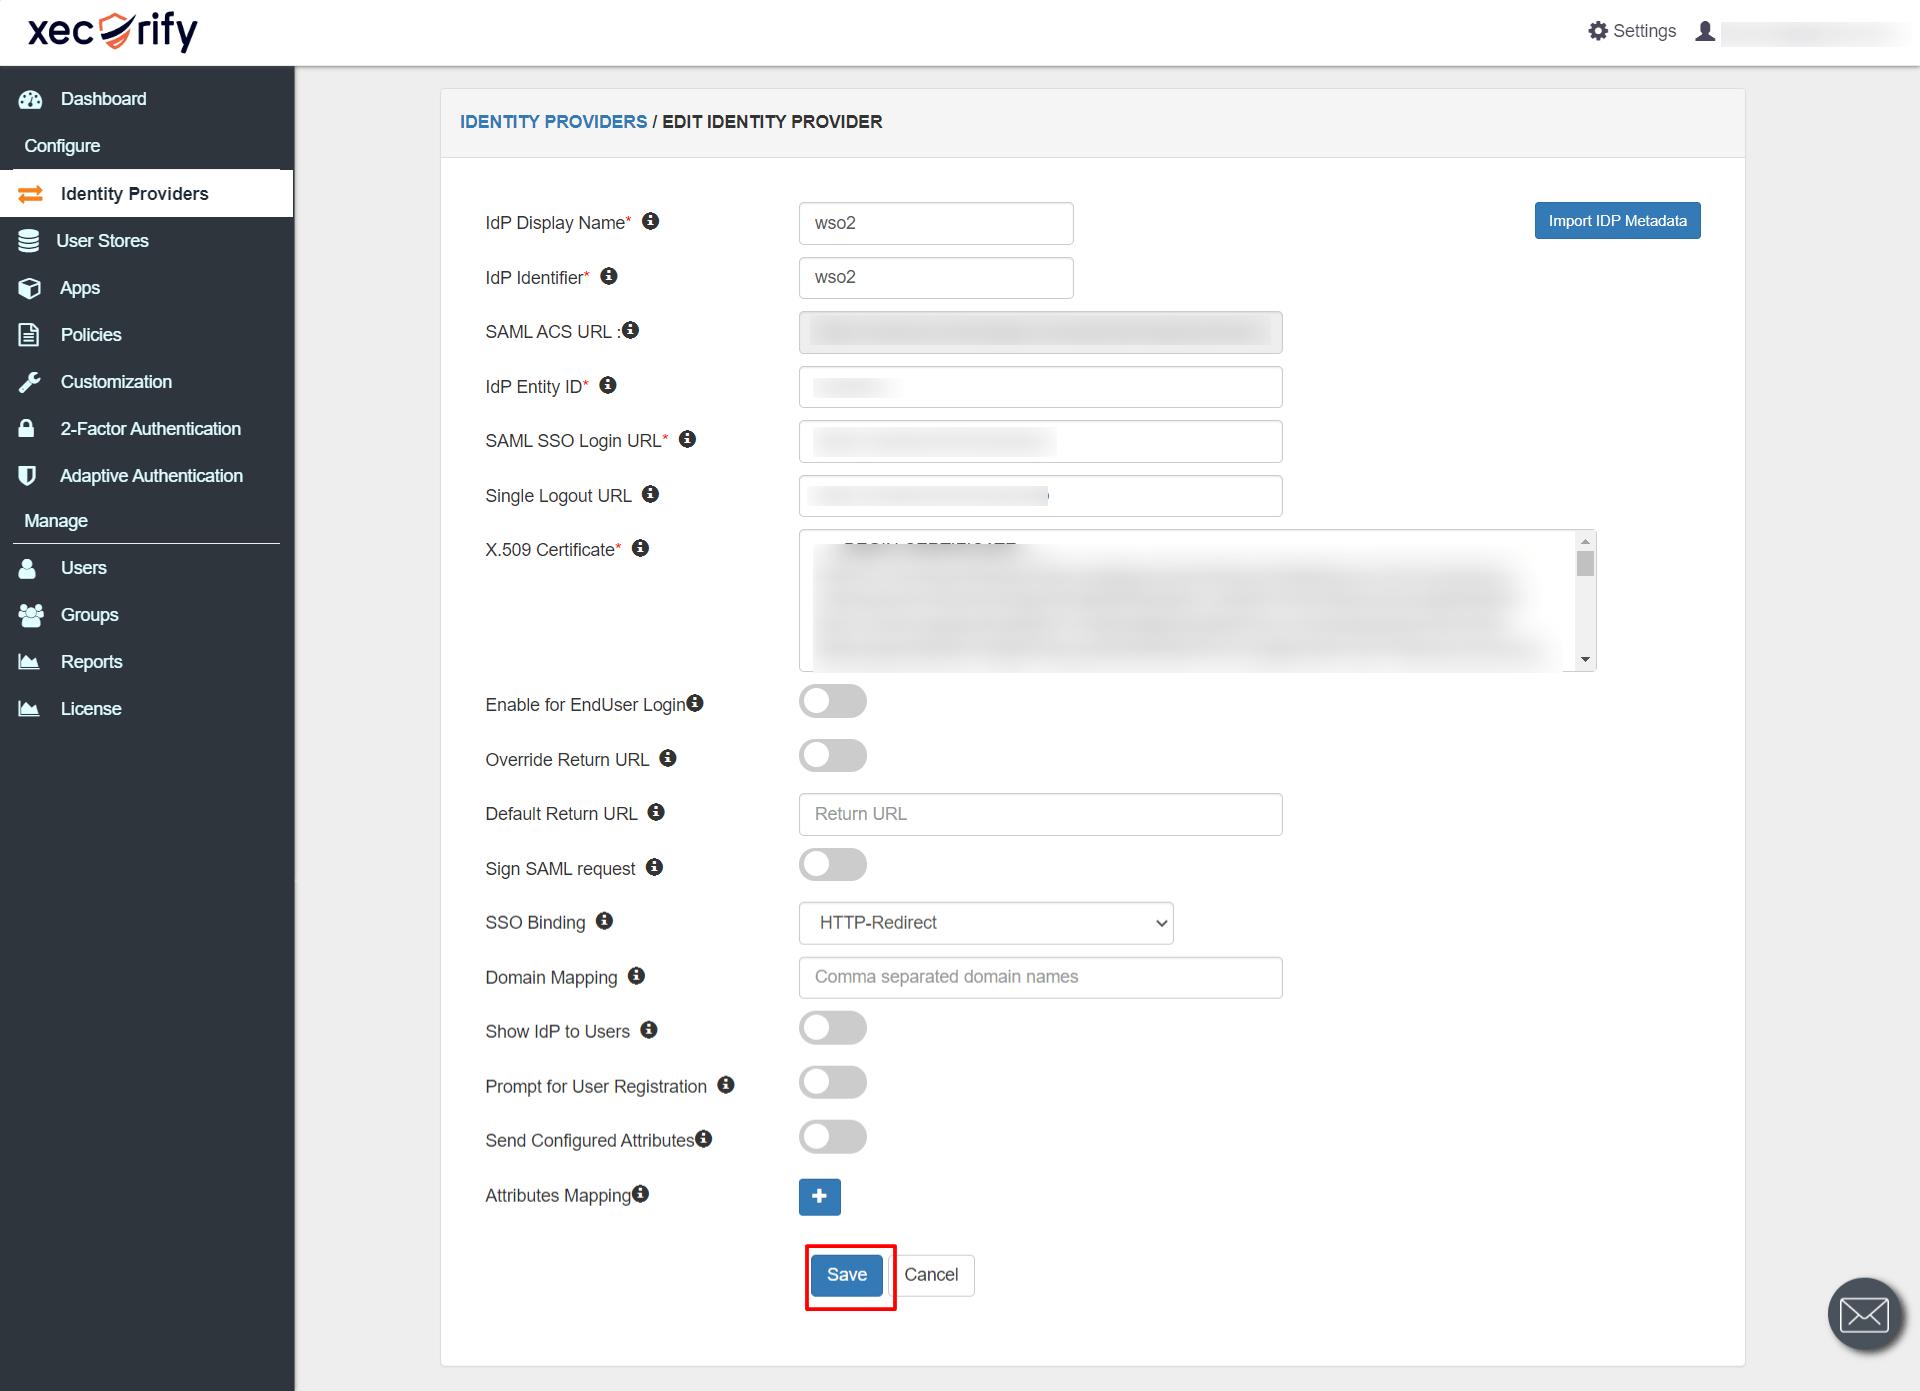 SAML SSO Login URL and x.509 Certificate